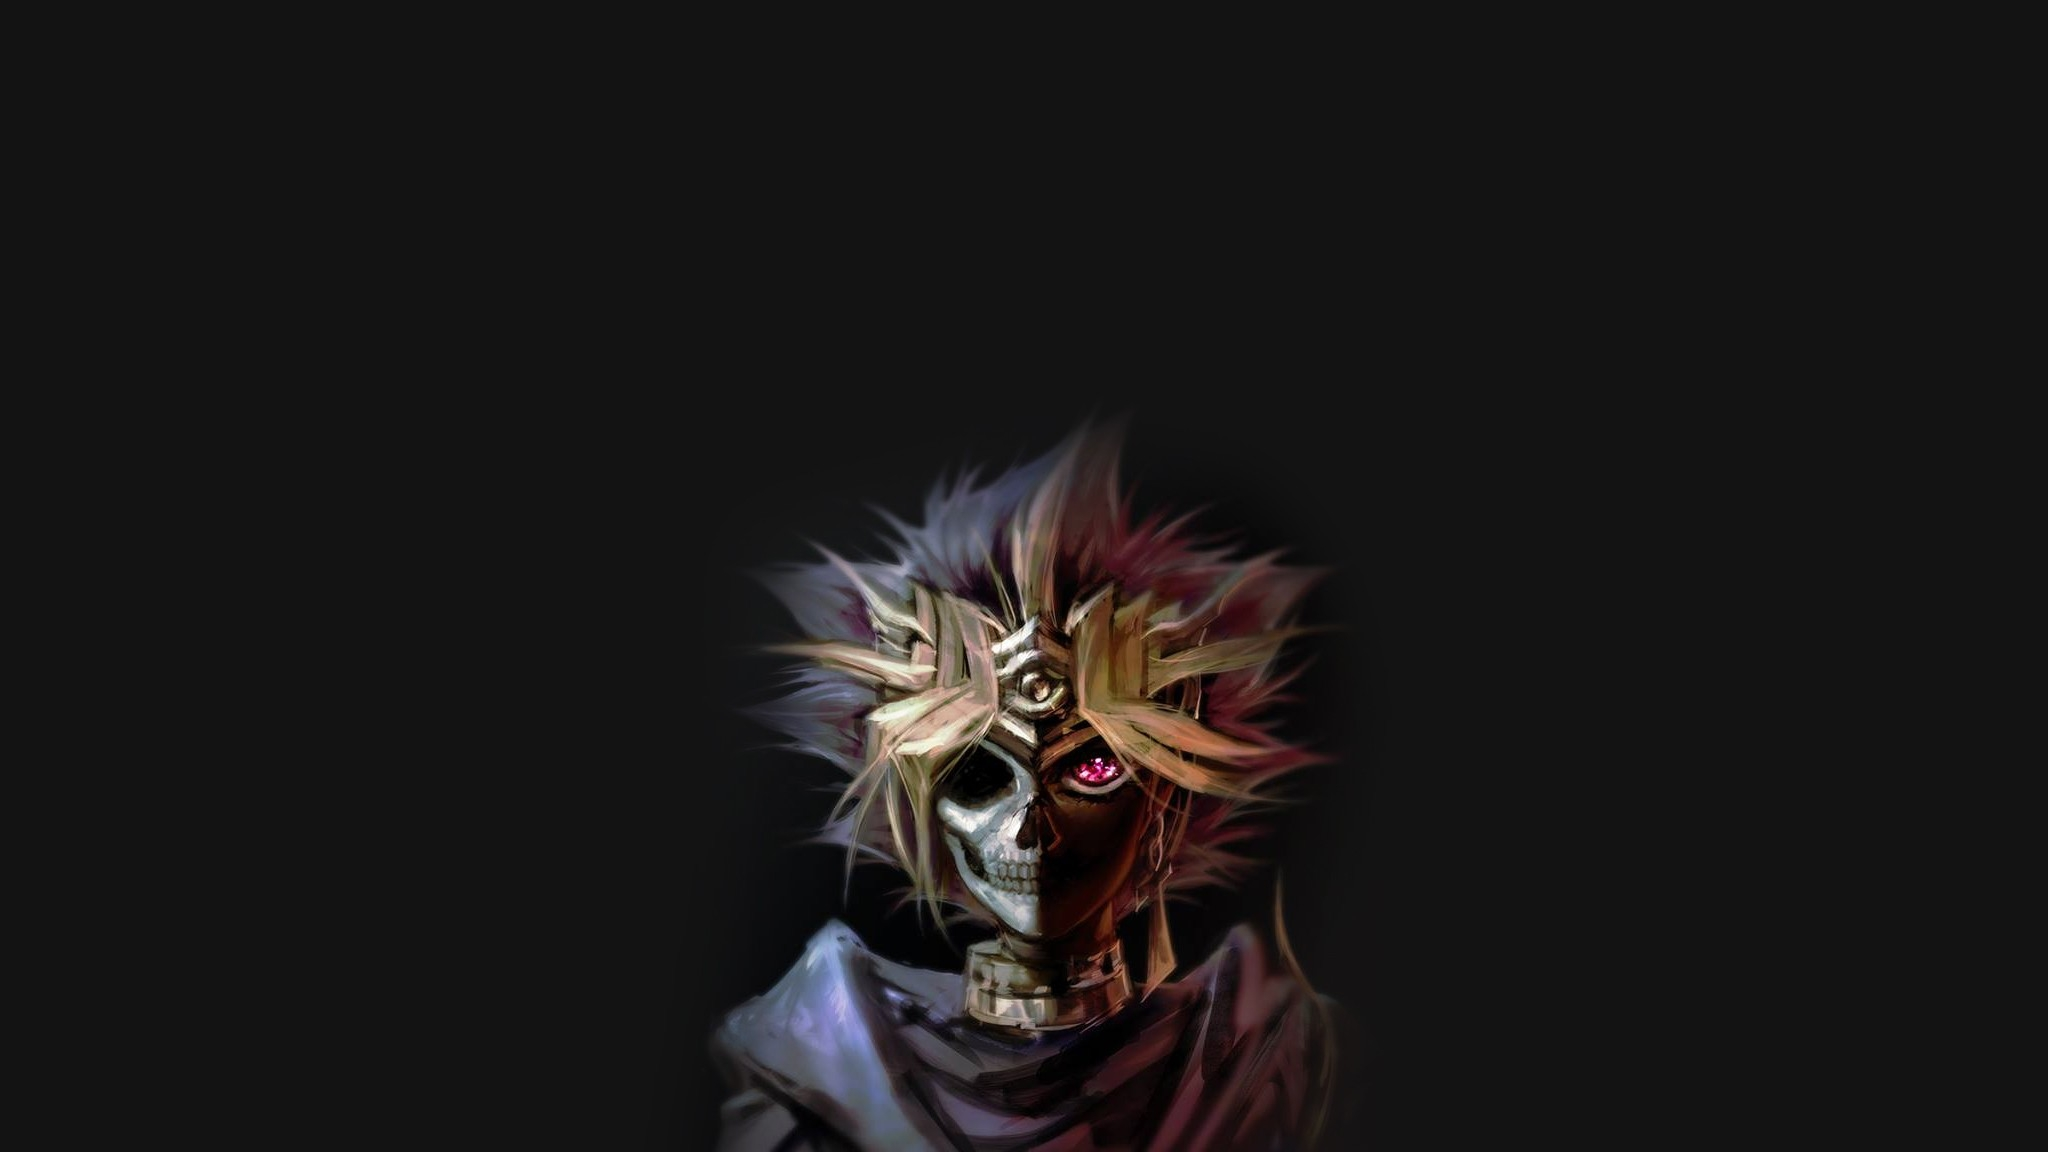 Download 2048x1152 Yu gi oh Yami Yugi Skull Cape 2048x1152